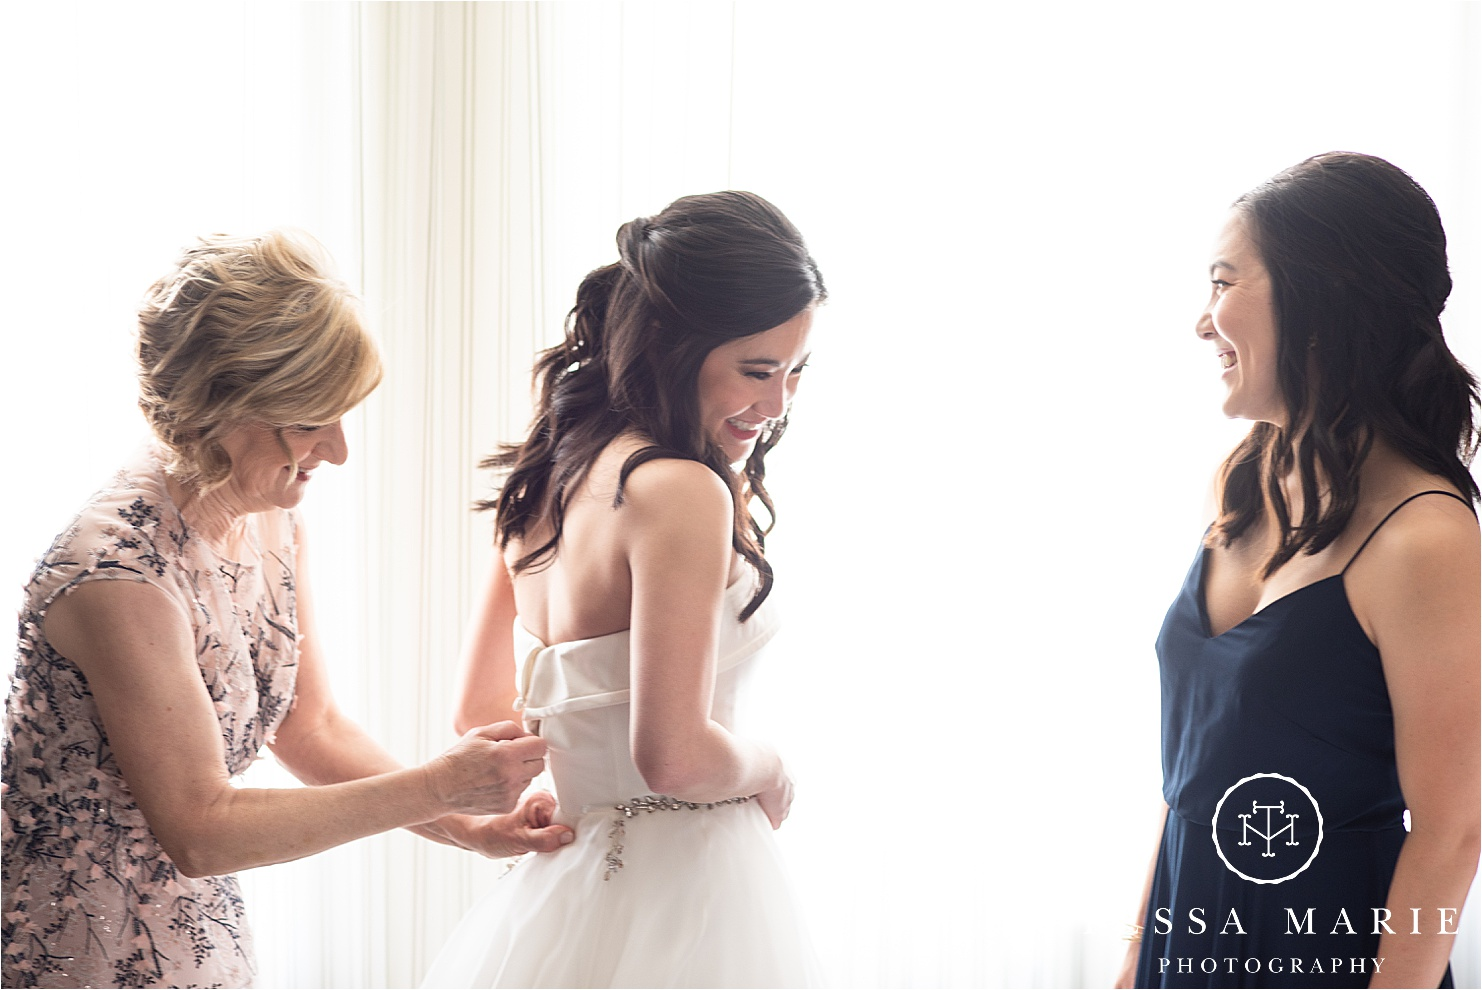 Tessa_marie_weddings_houston_wedding_photographer_The_astorian_0017.jpg